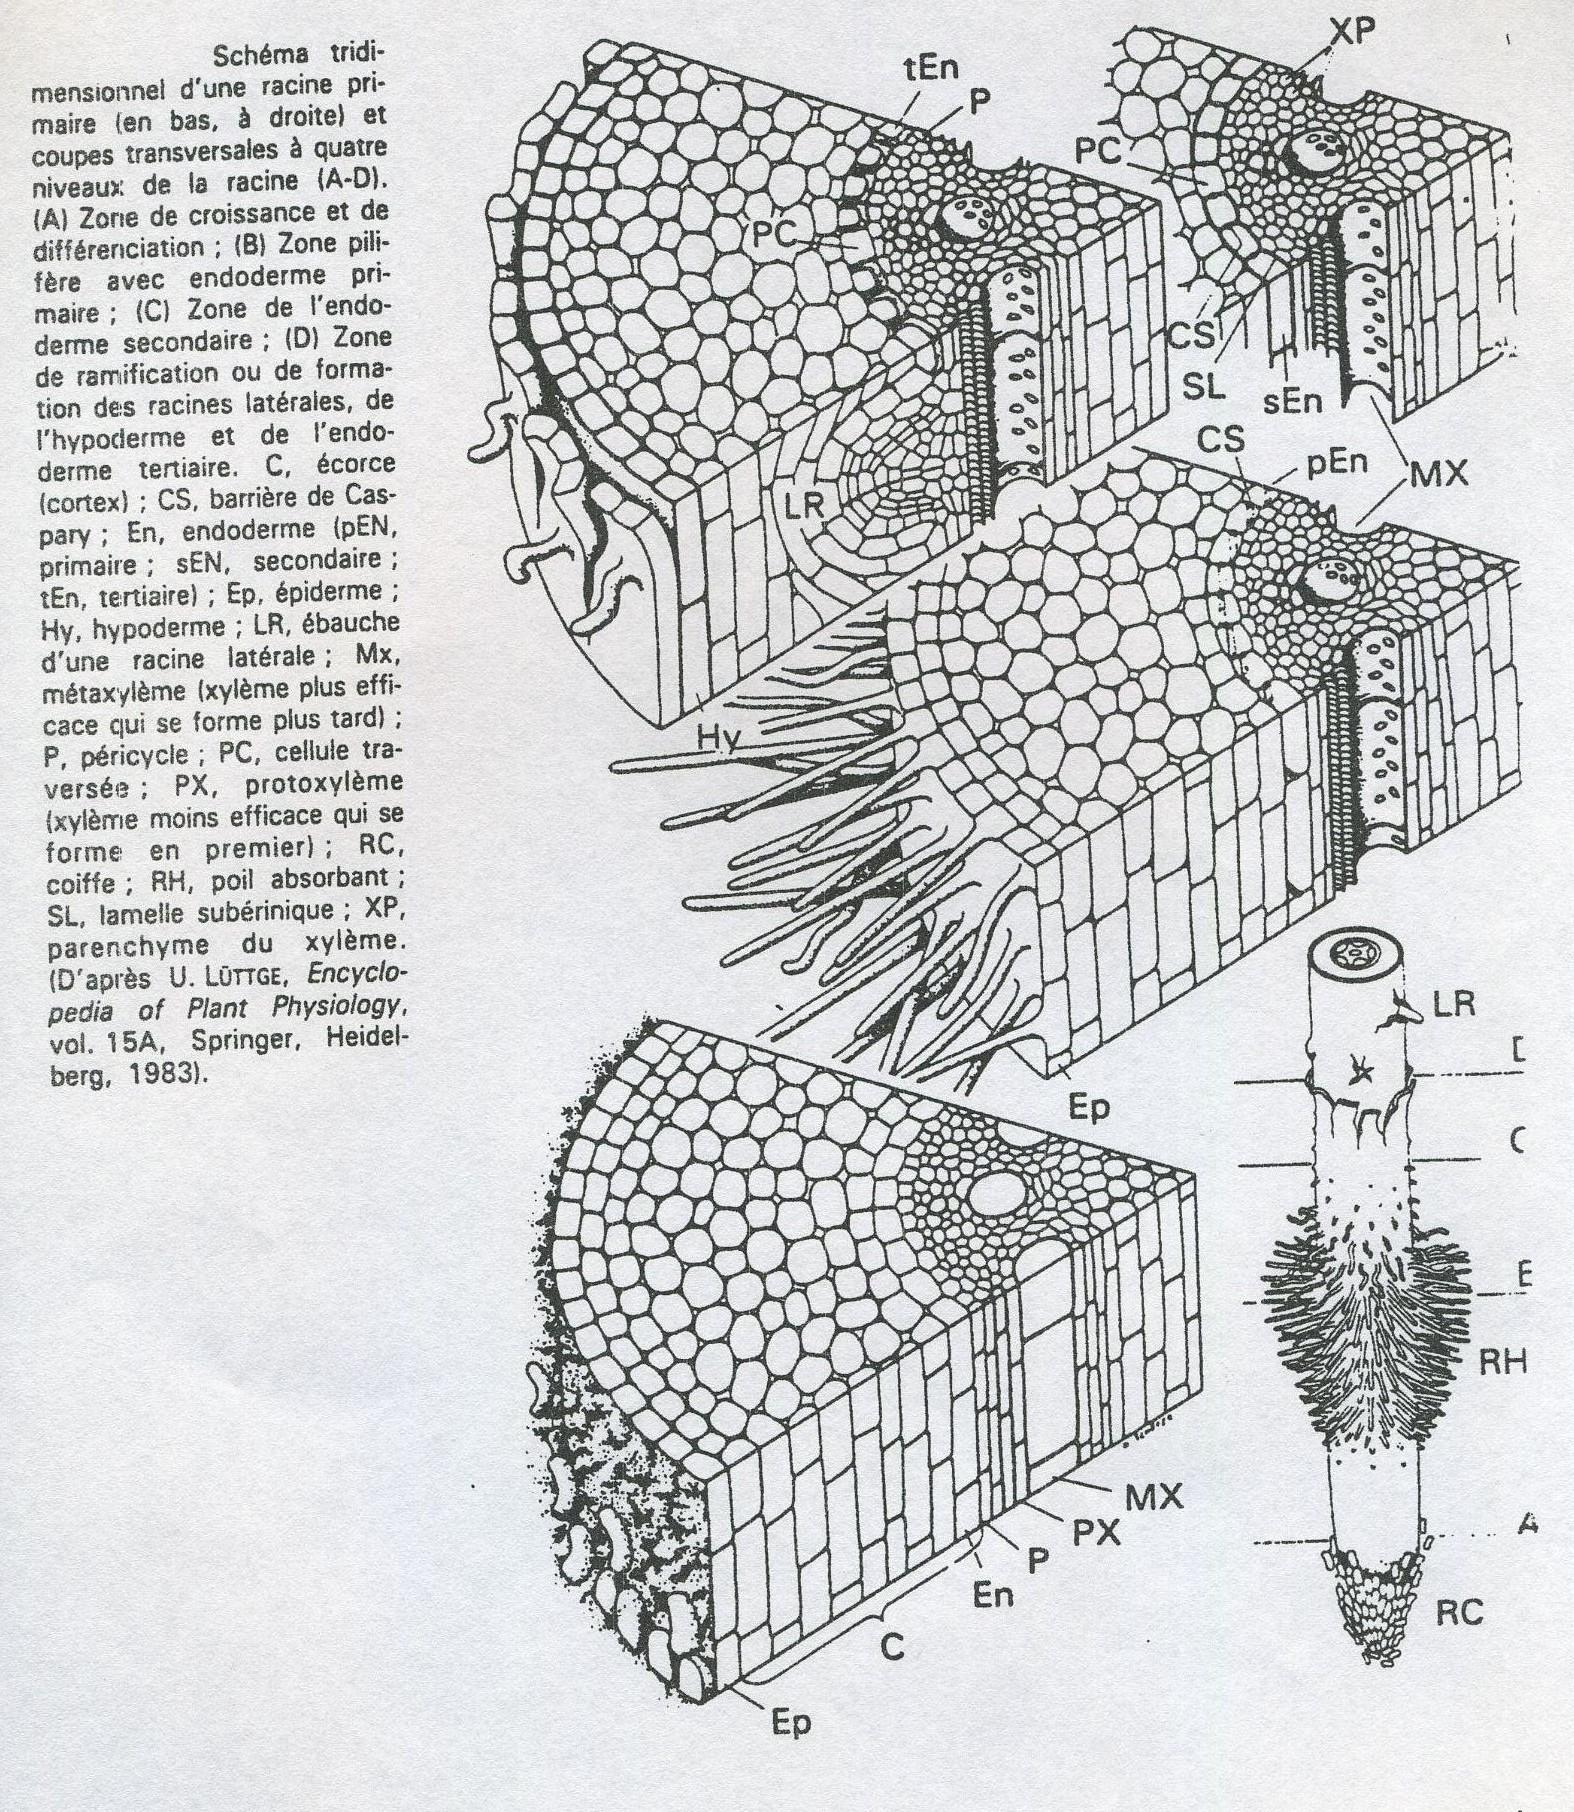 laracineschmaslgends038.jpg